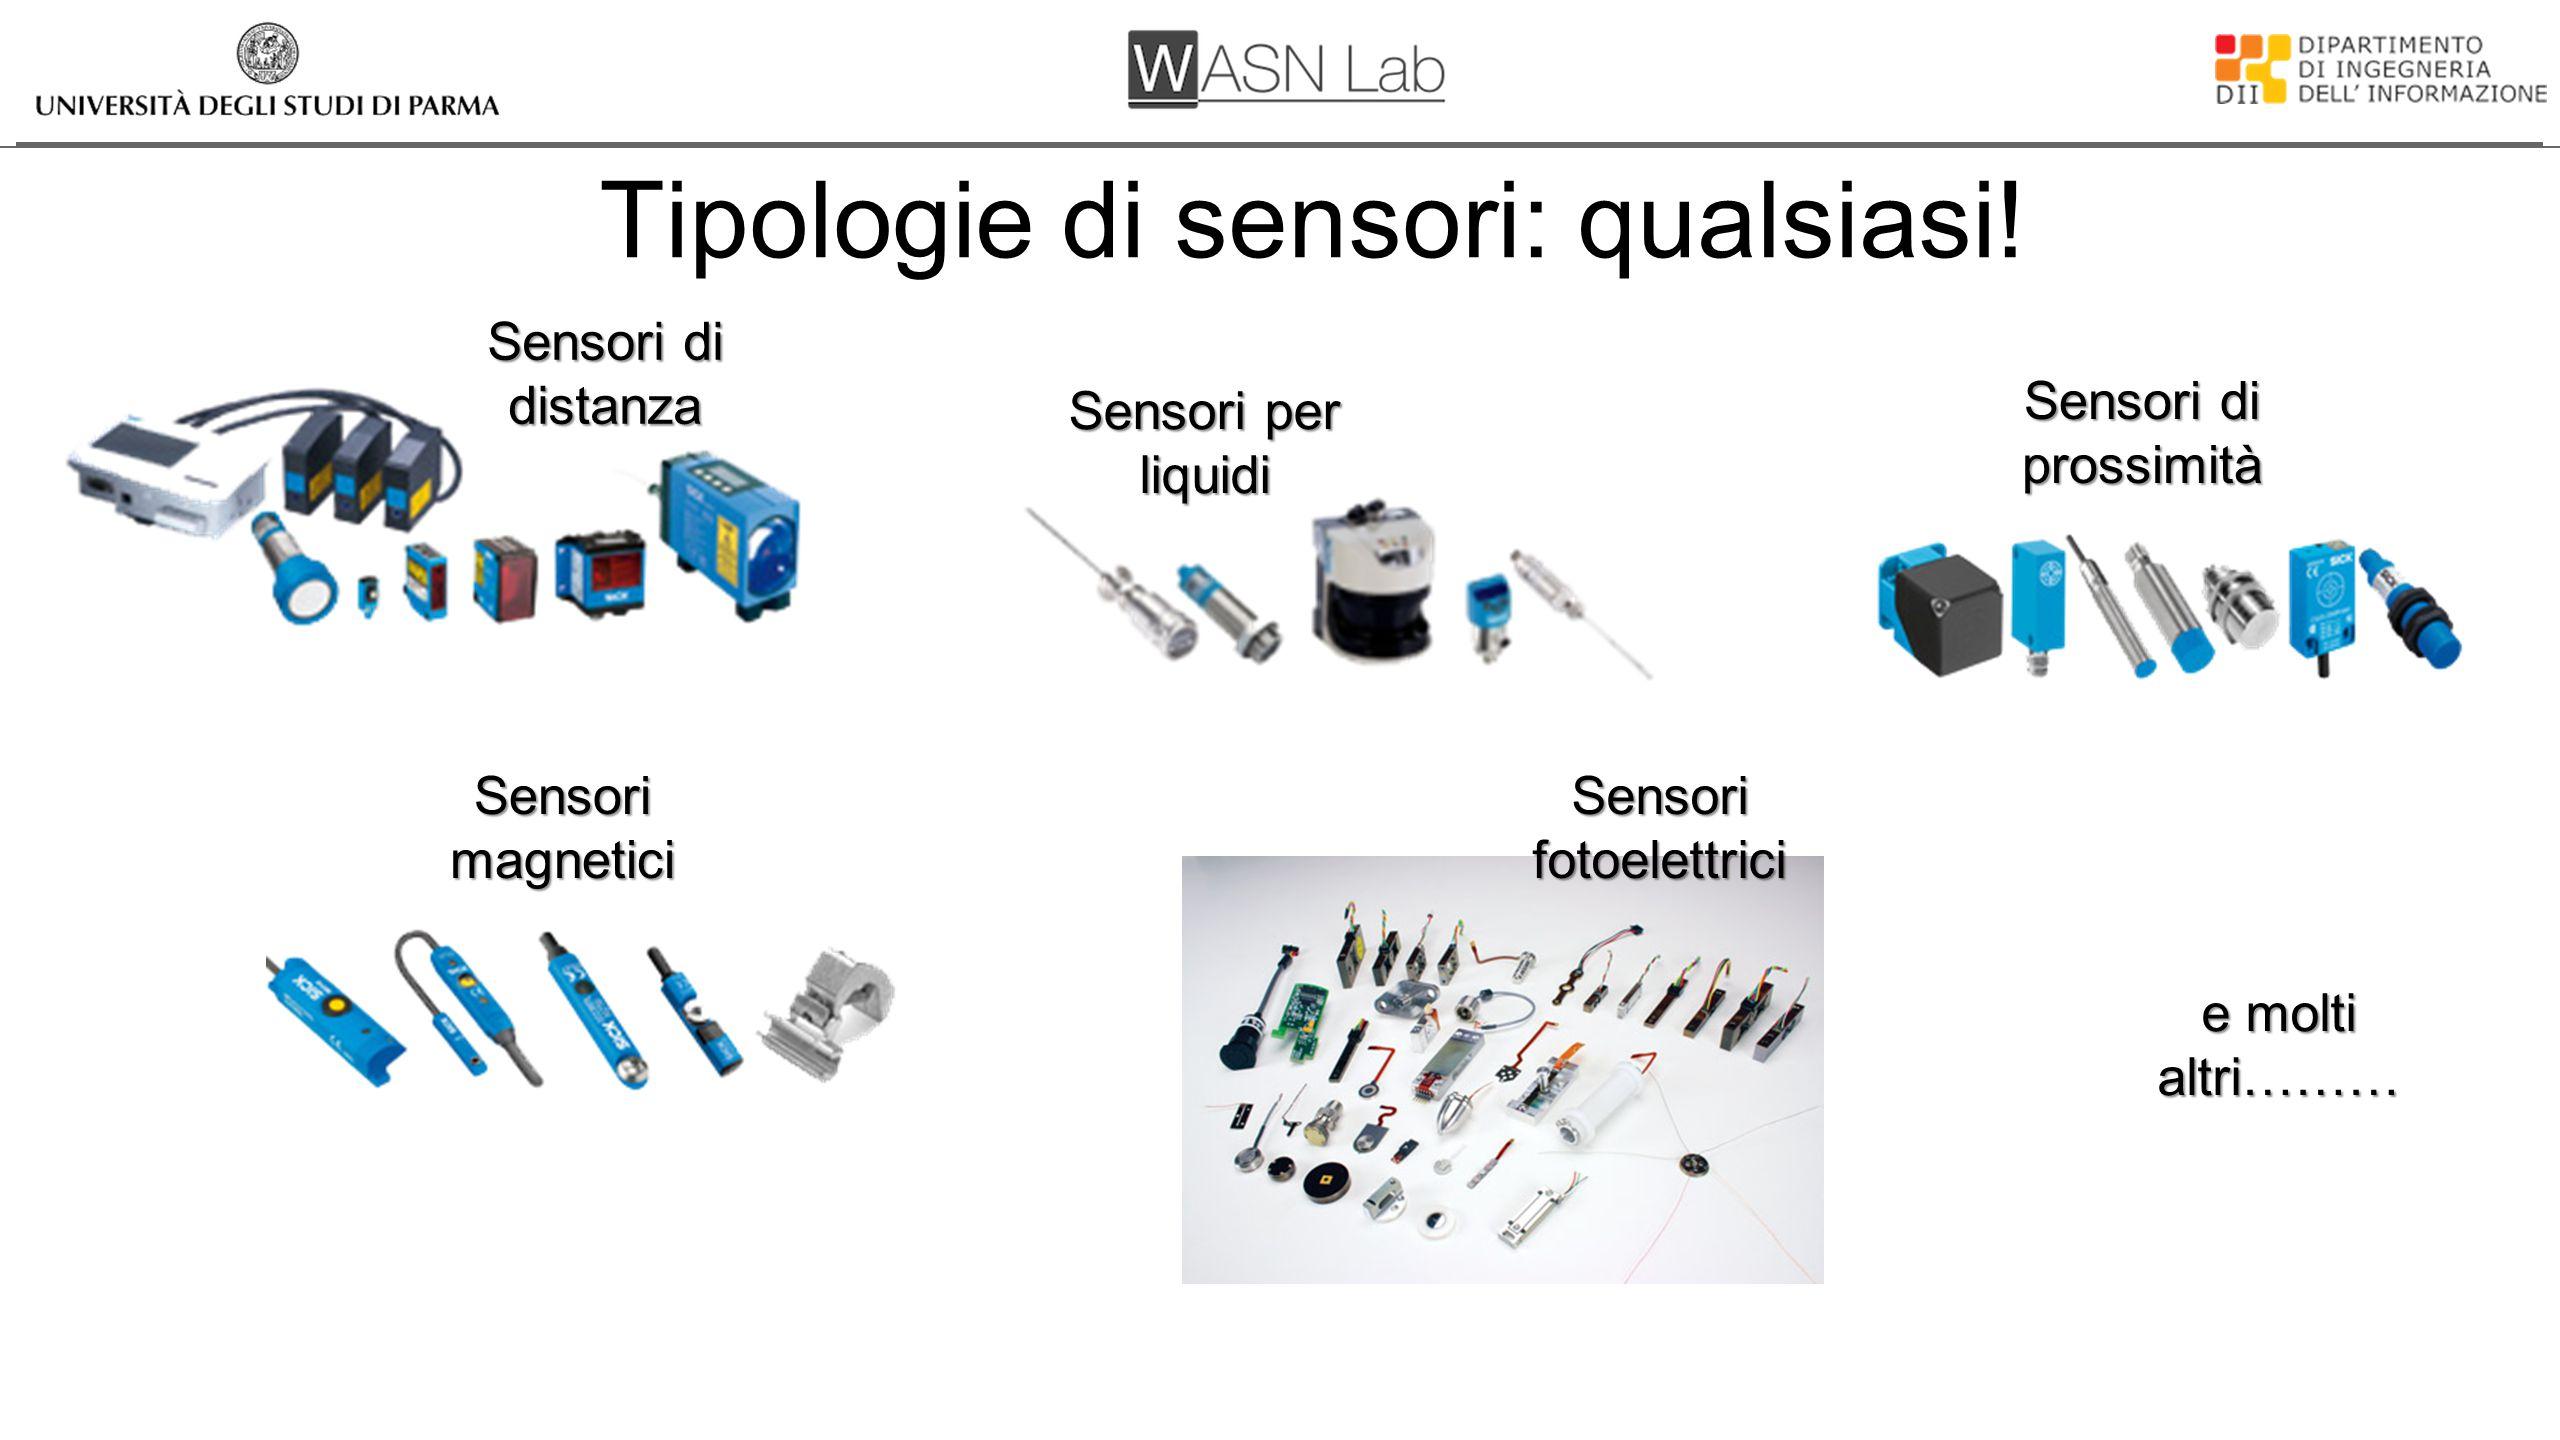 Tipologie di sensori: qualsiasi!